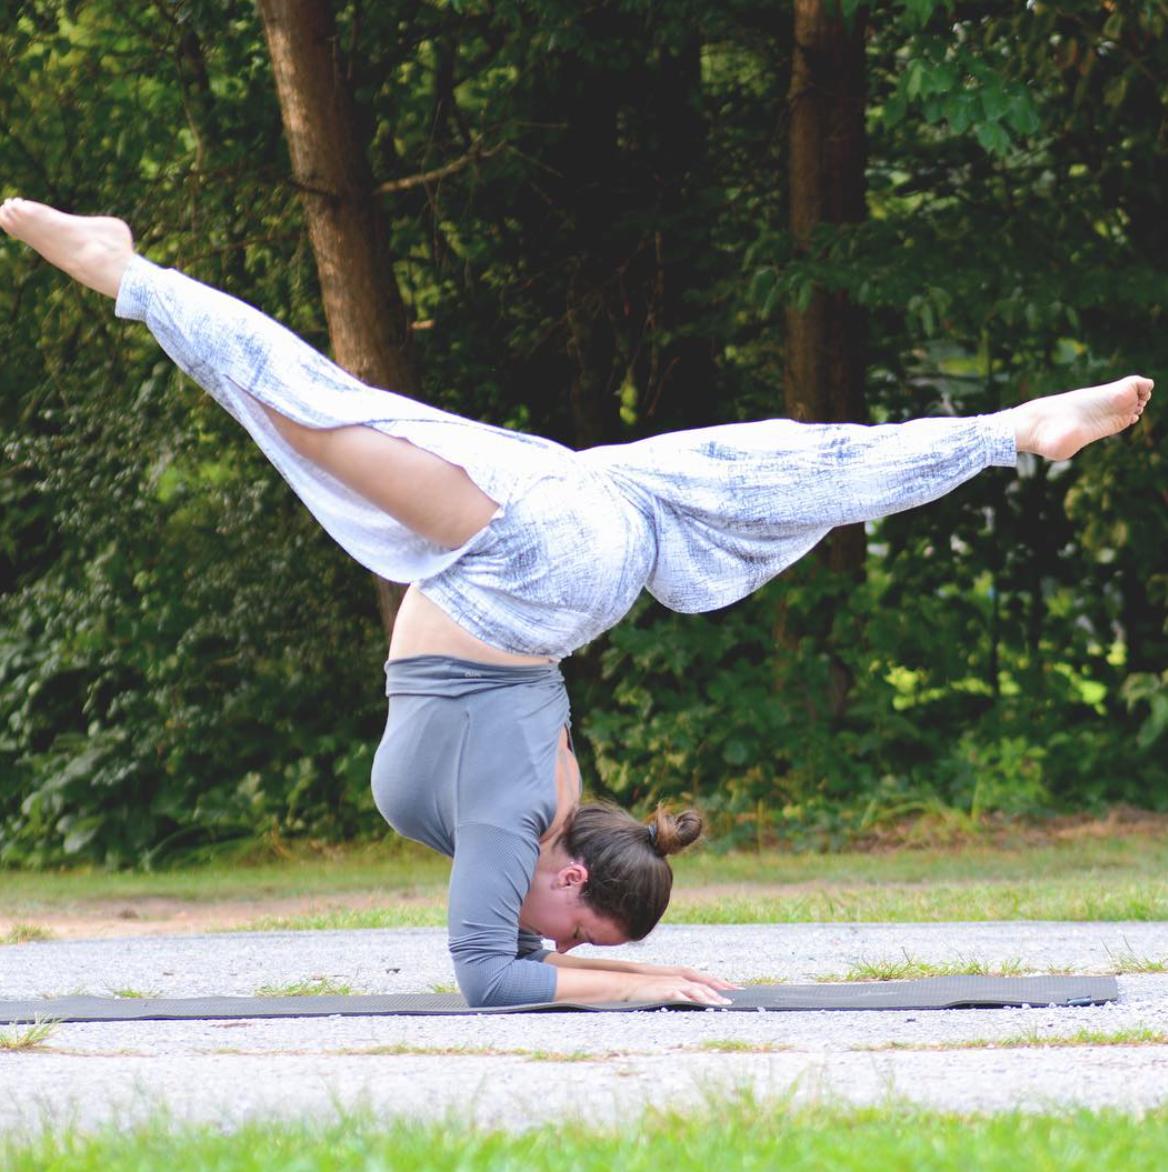 52fefc30e3404 Intention Pant   Yoga Inspiration   Yoga, Yoga inspiration, Yoga fitness